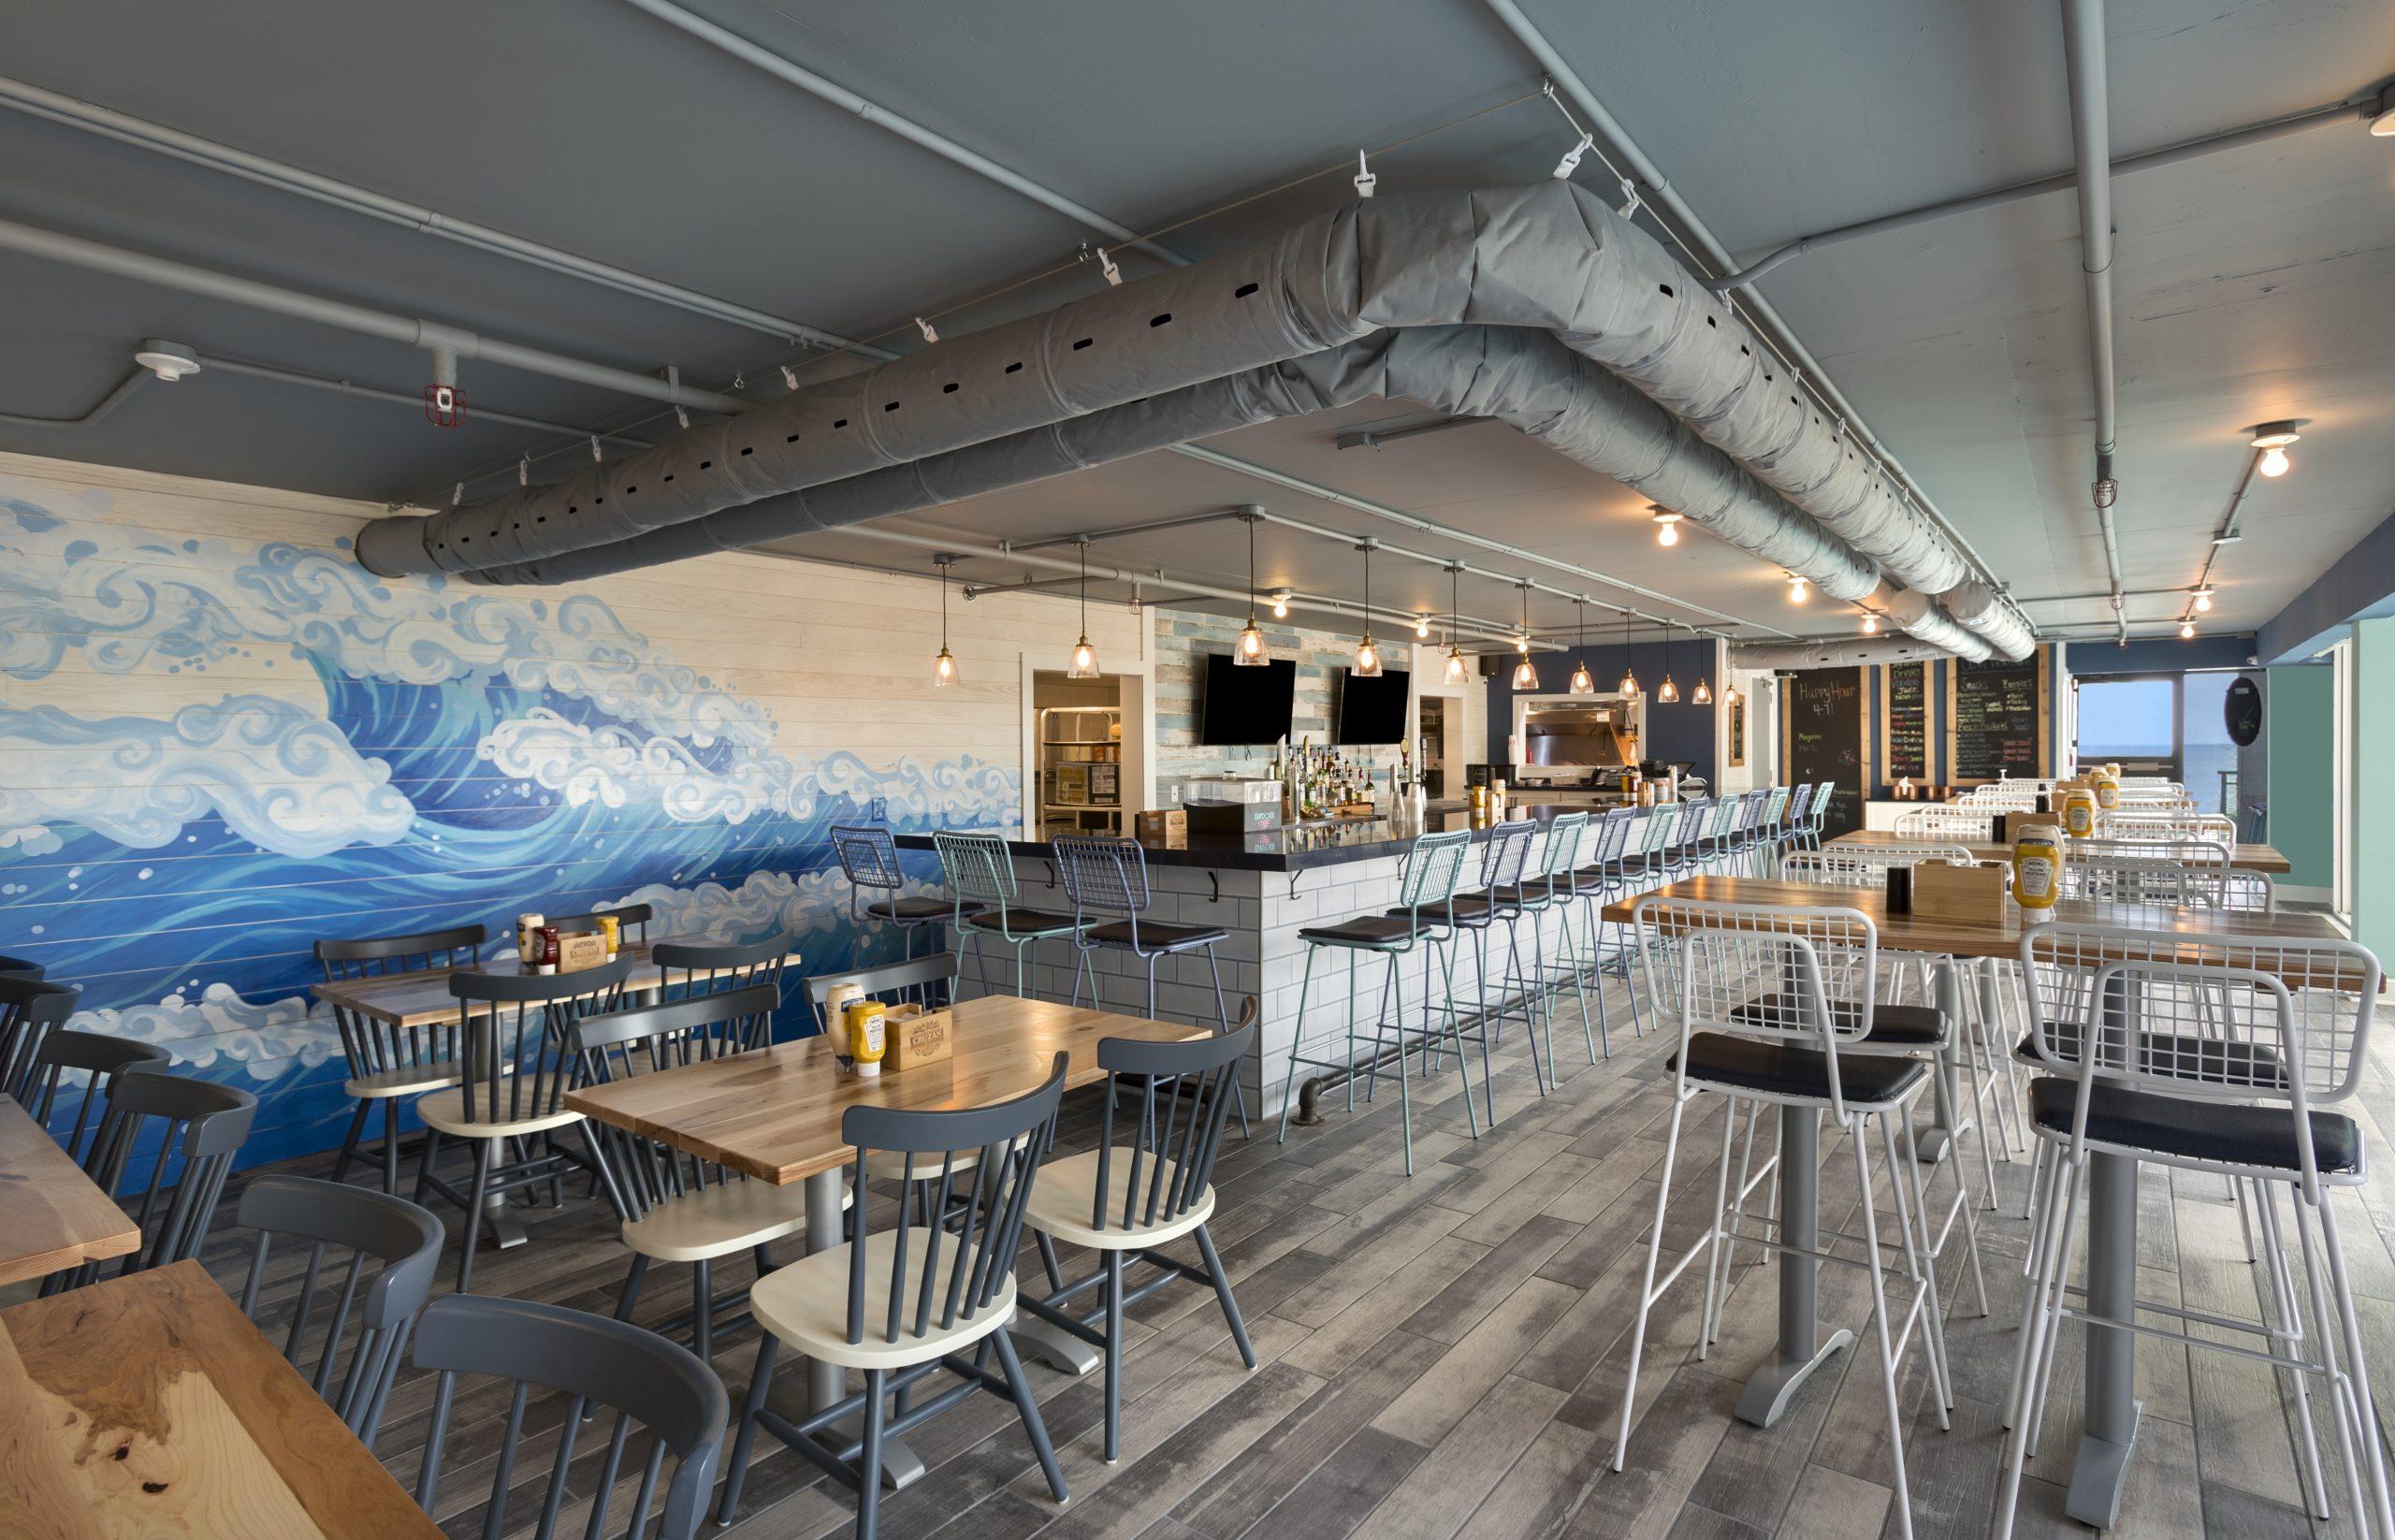 Turtle Bay Cafe